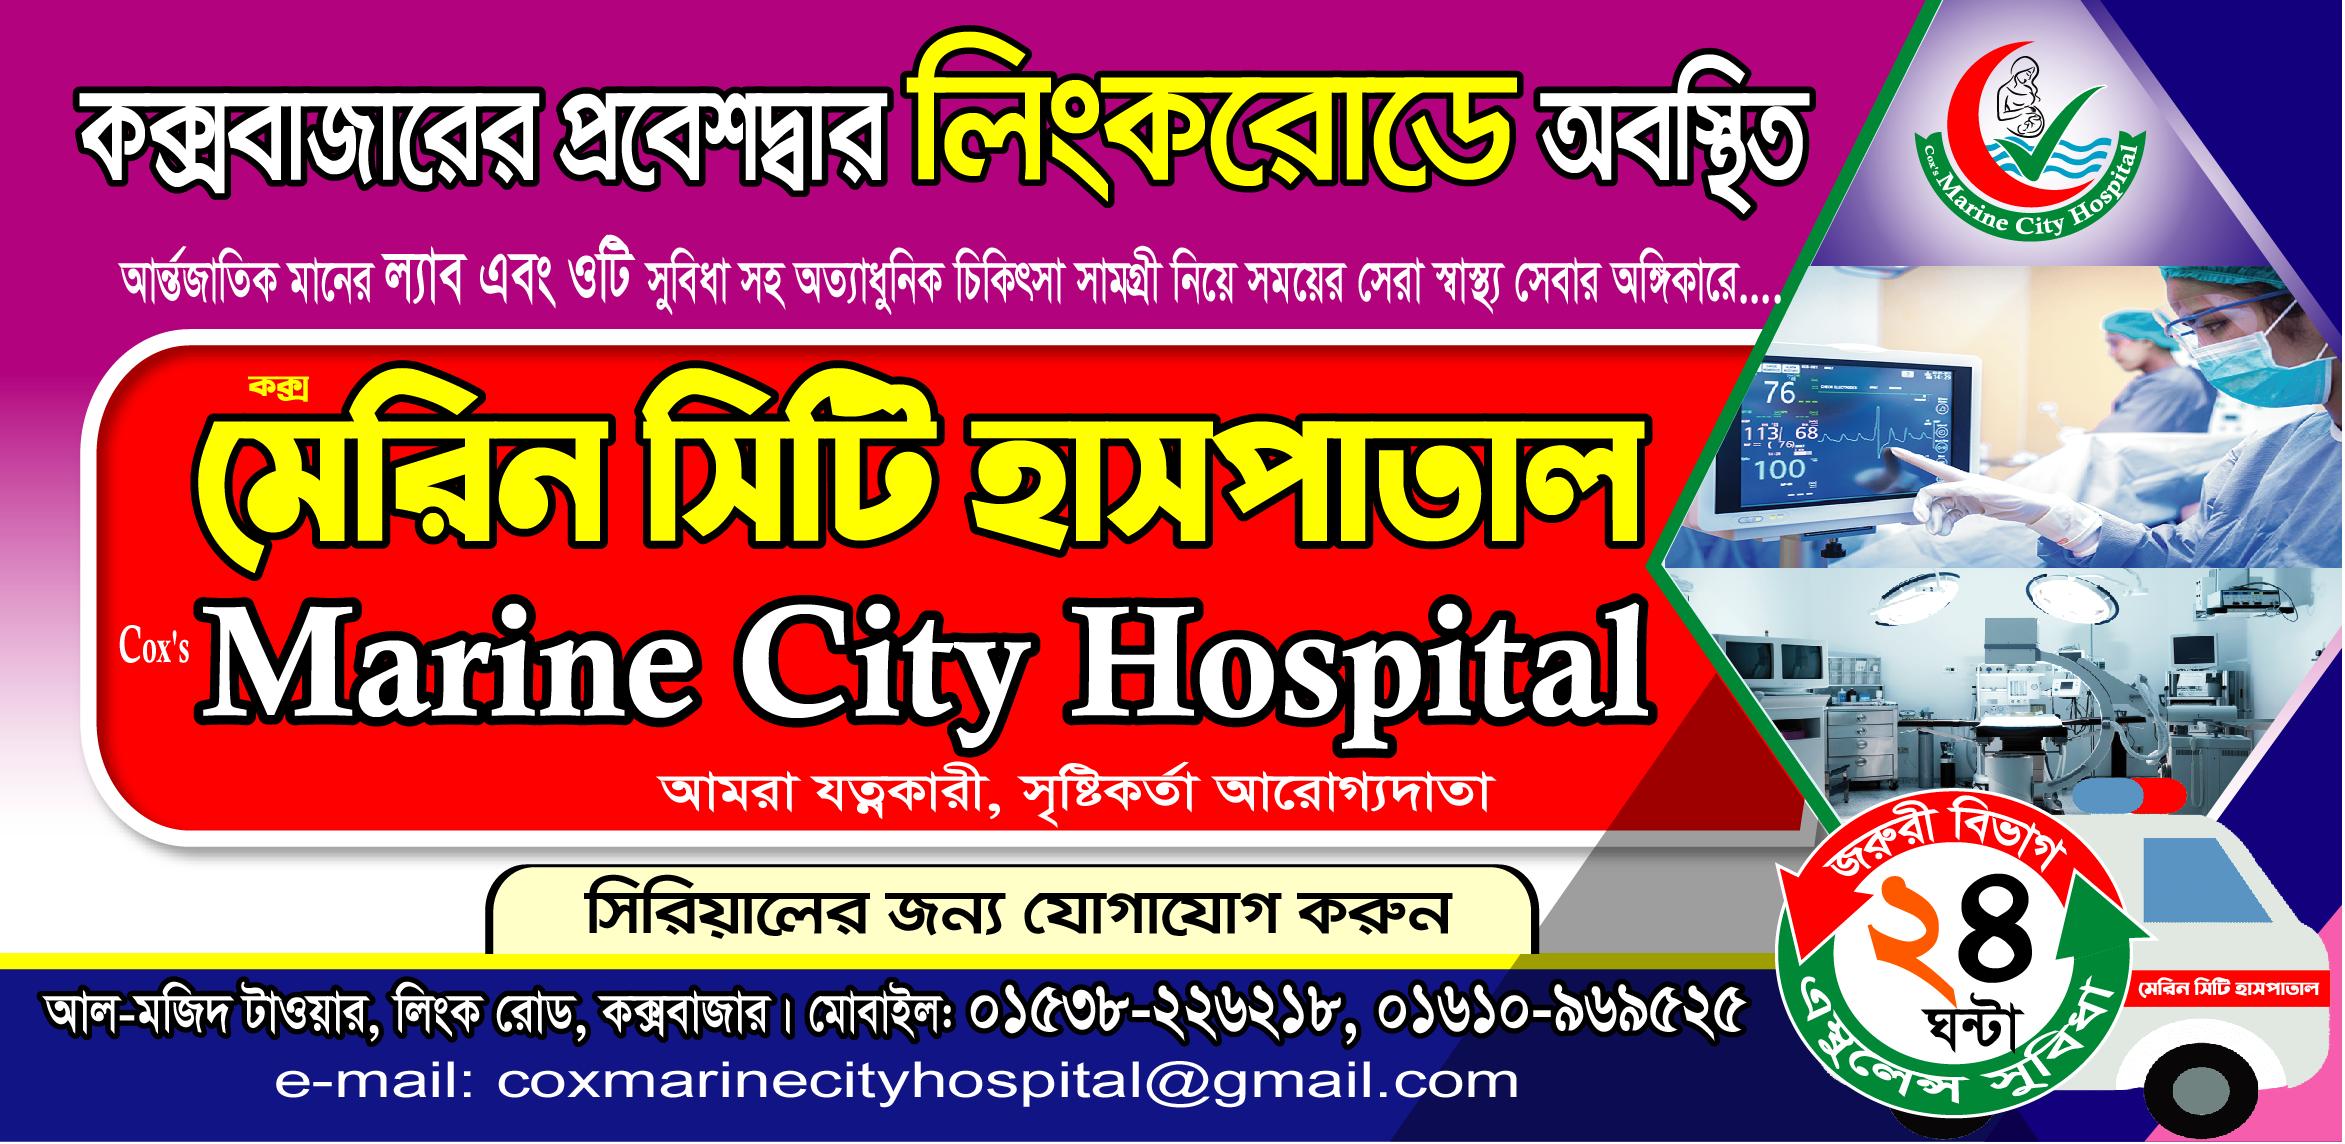 merin city hospital